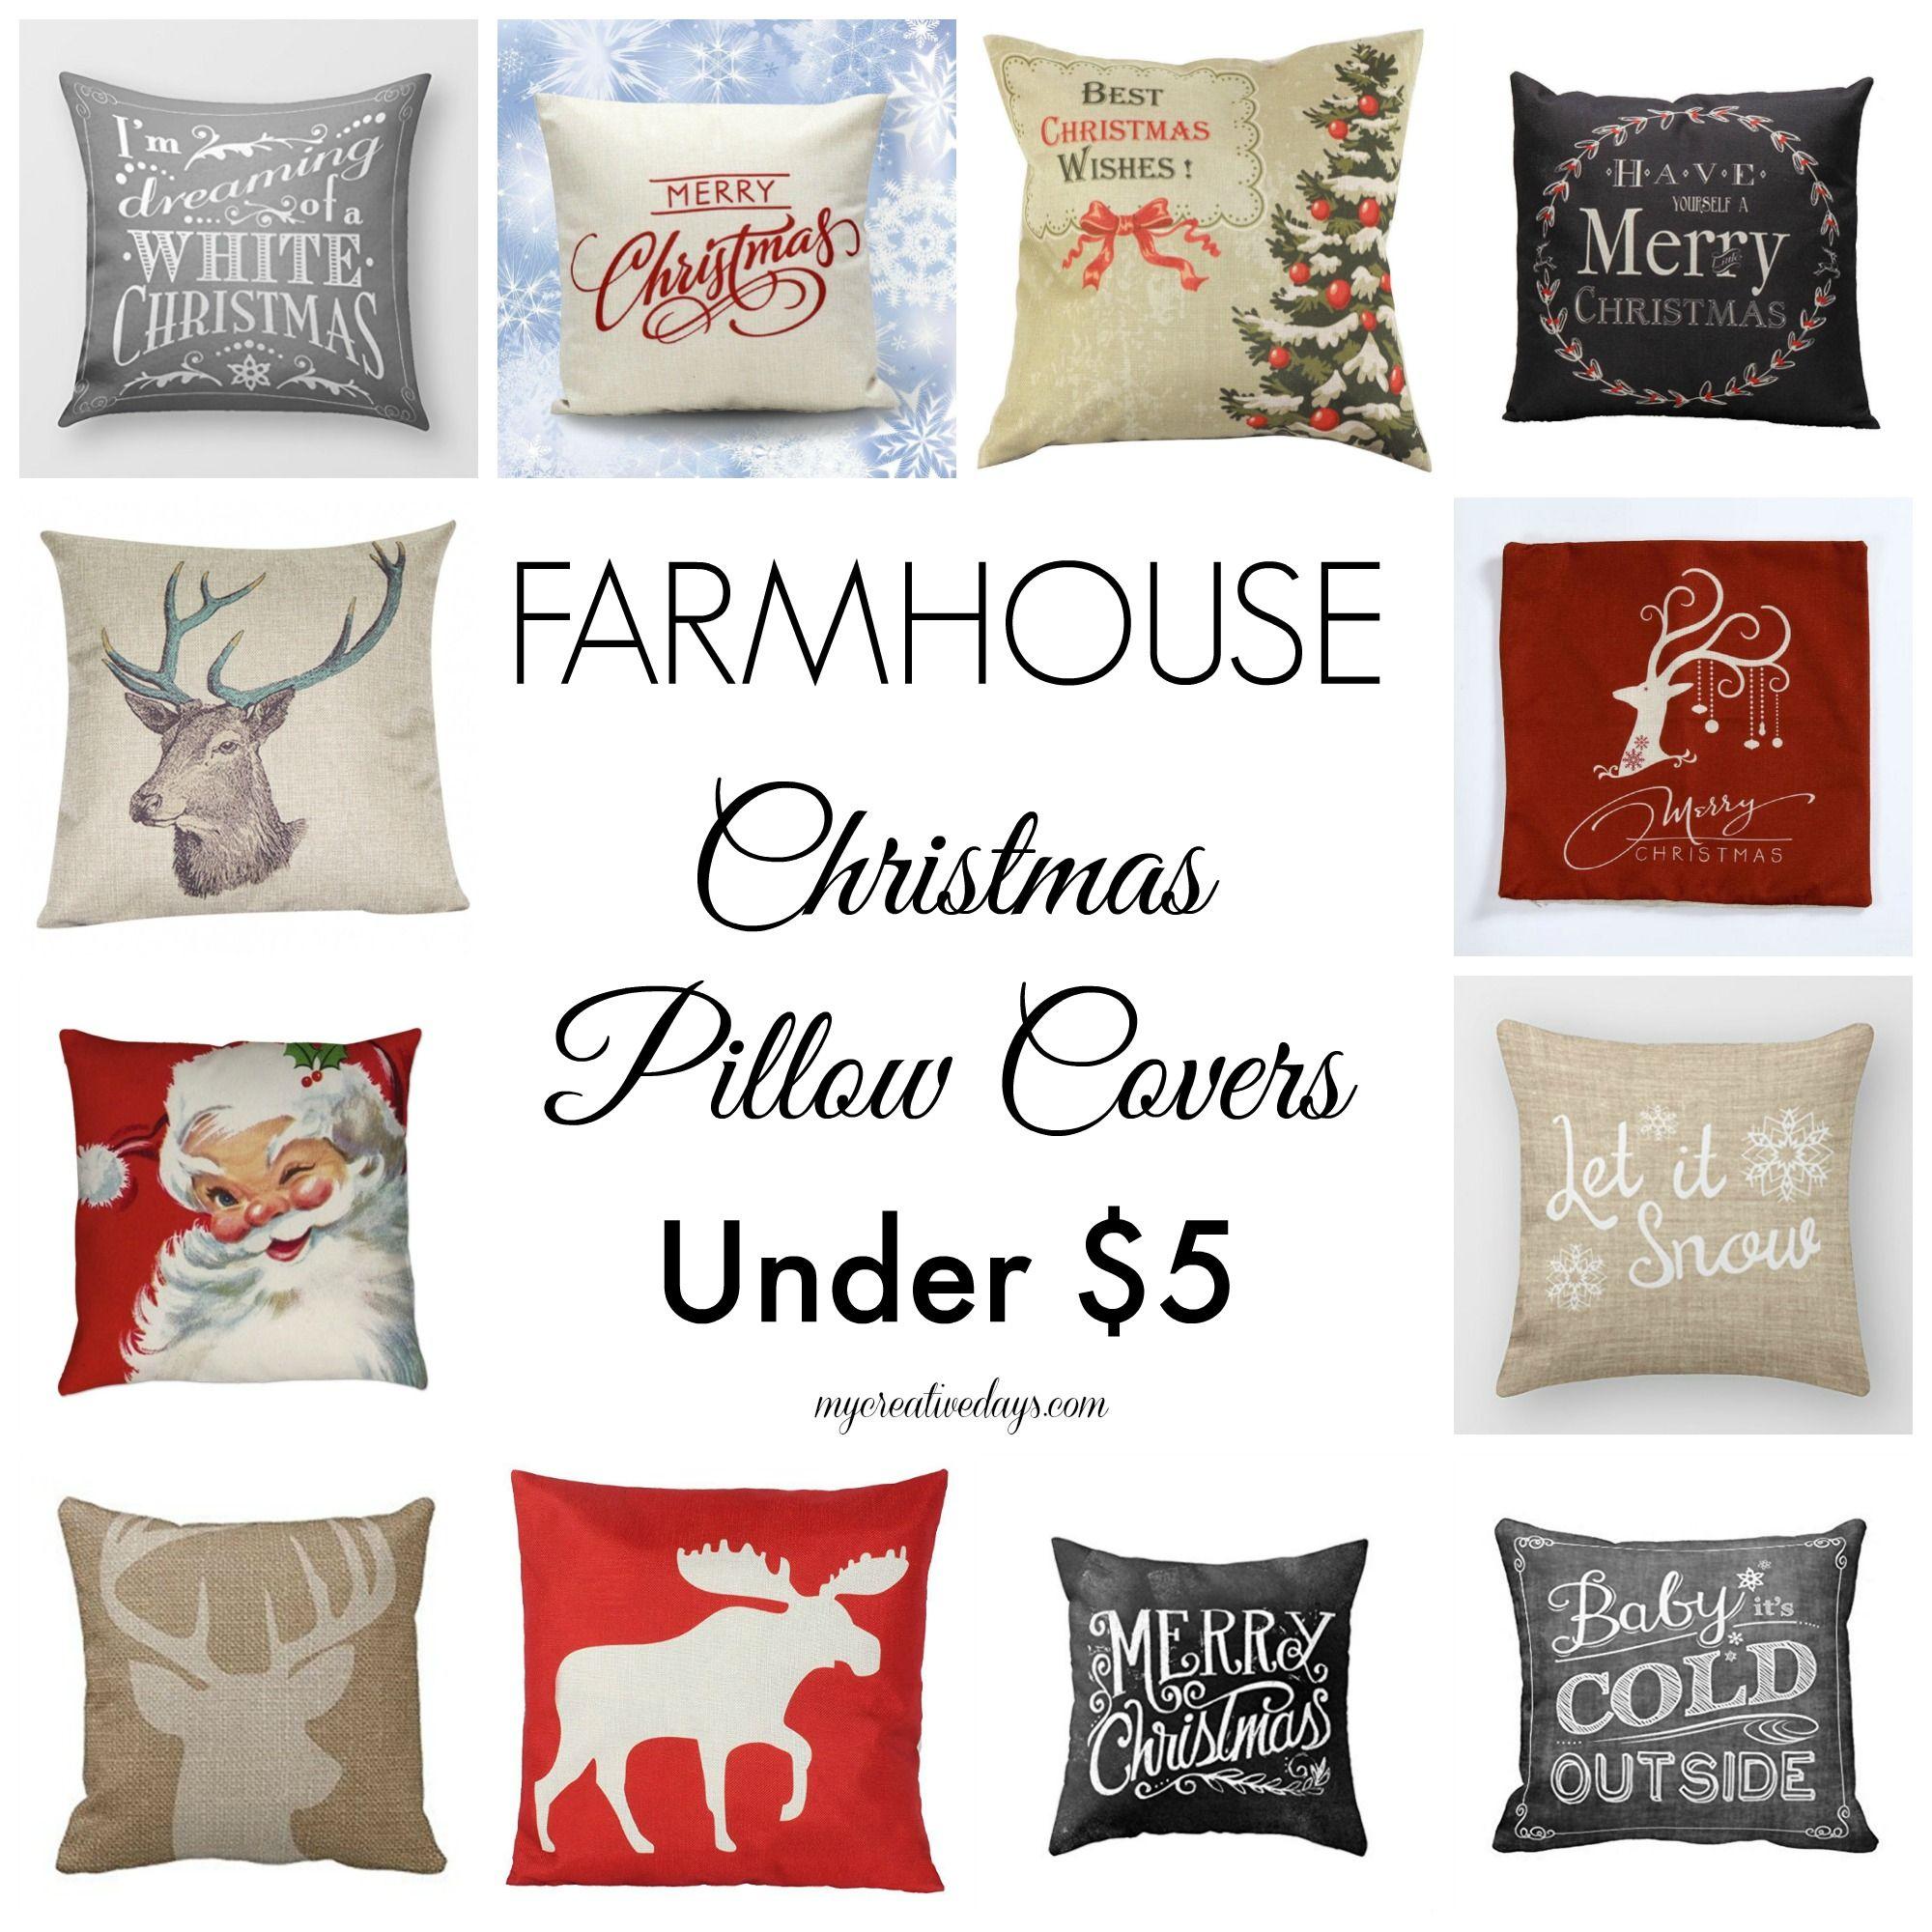 square pillow c navy decor t cheap wholesale decorative shirts store text printed nautica throw unisex pillows